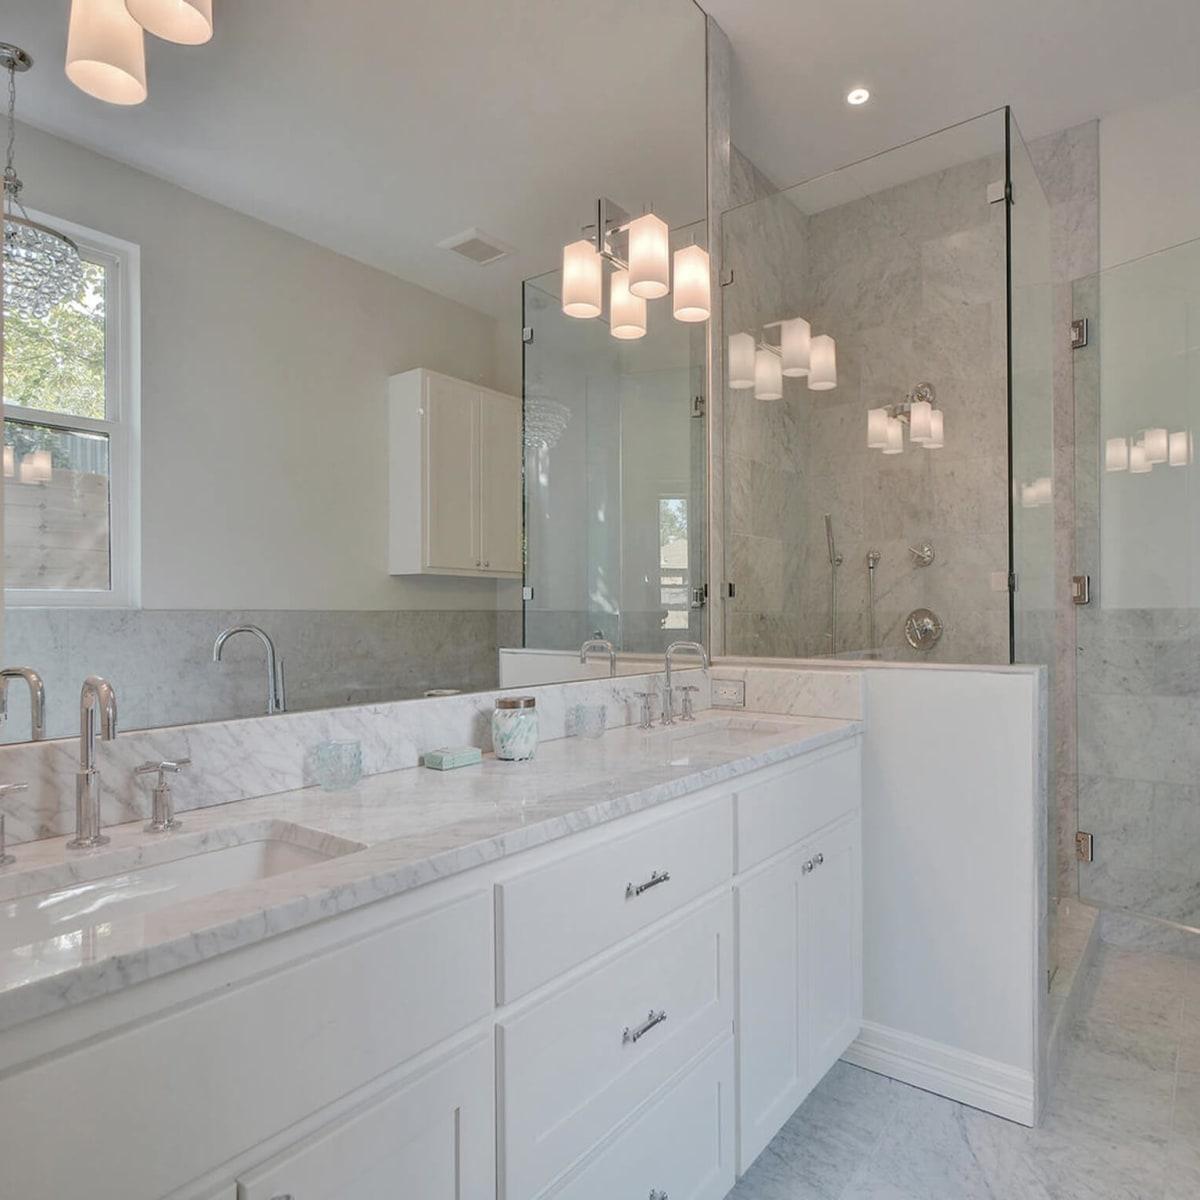 2010 Kinney Master Bathroom 1